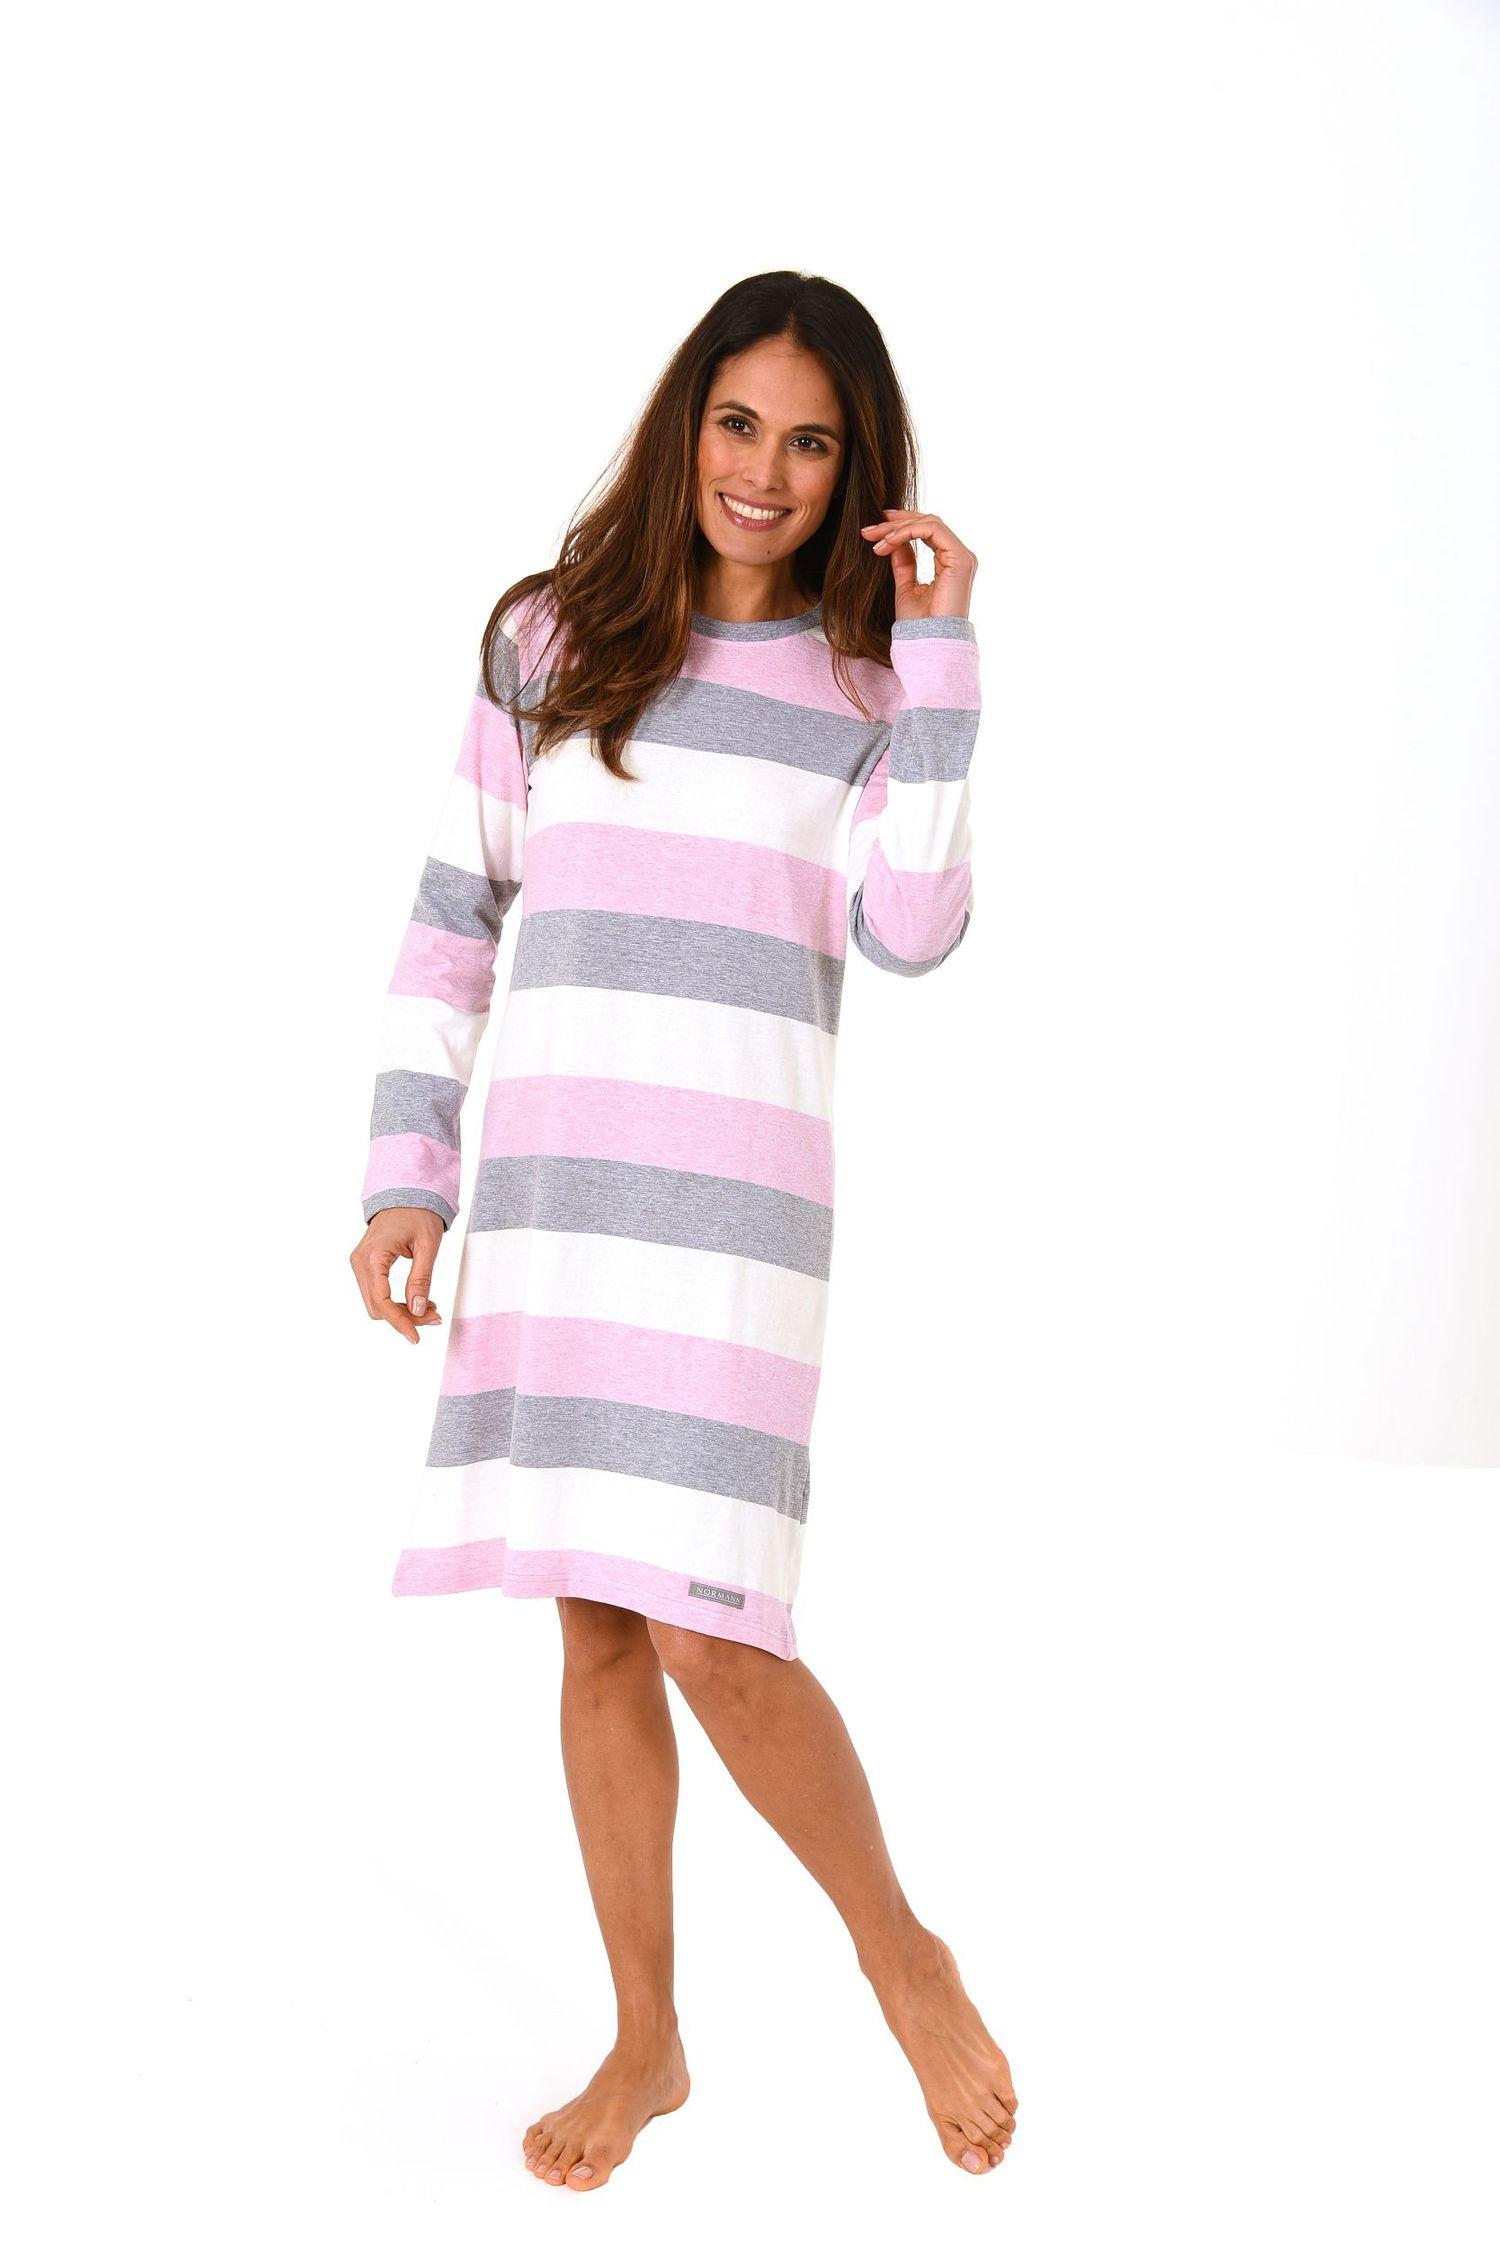 Tolles Damen Nachthemd langarm in wunderschöner Block Streifen Optik – 271 213 90 101